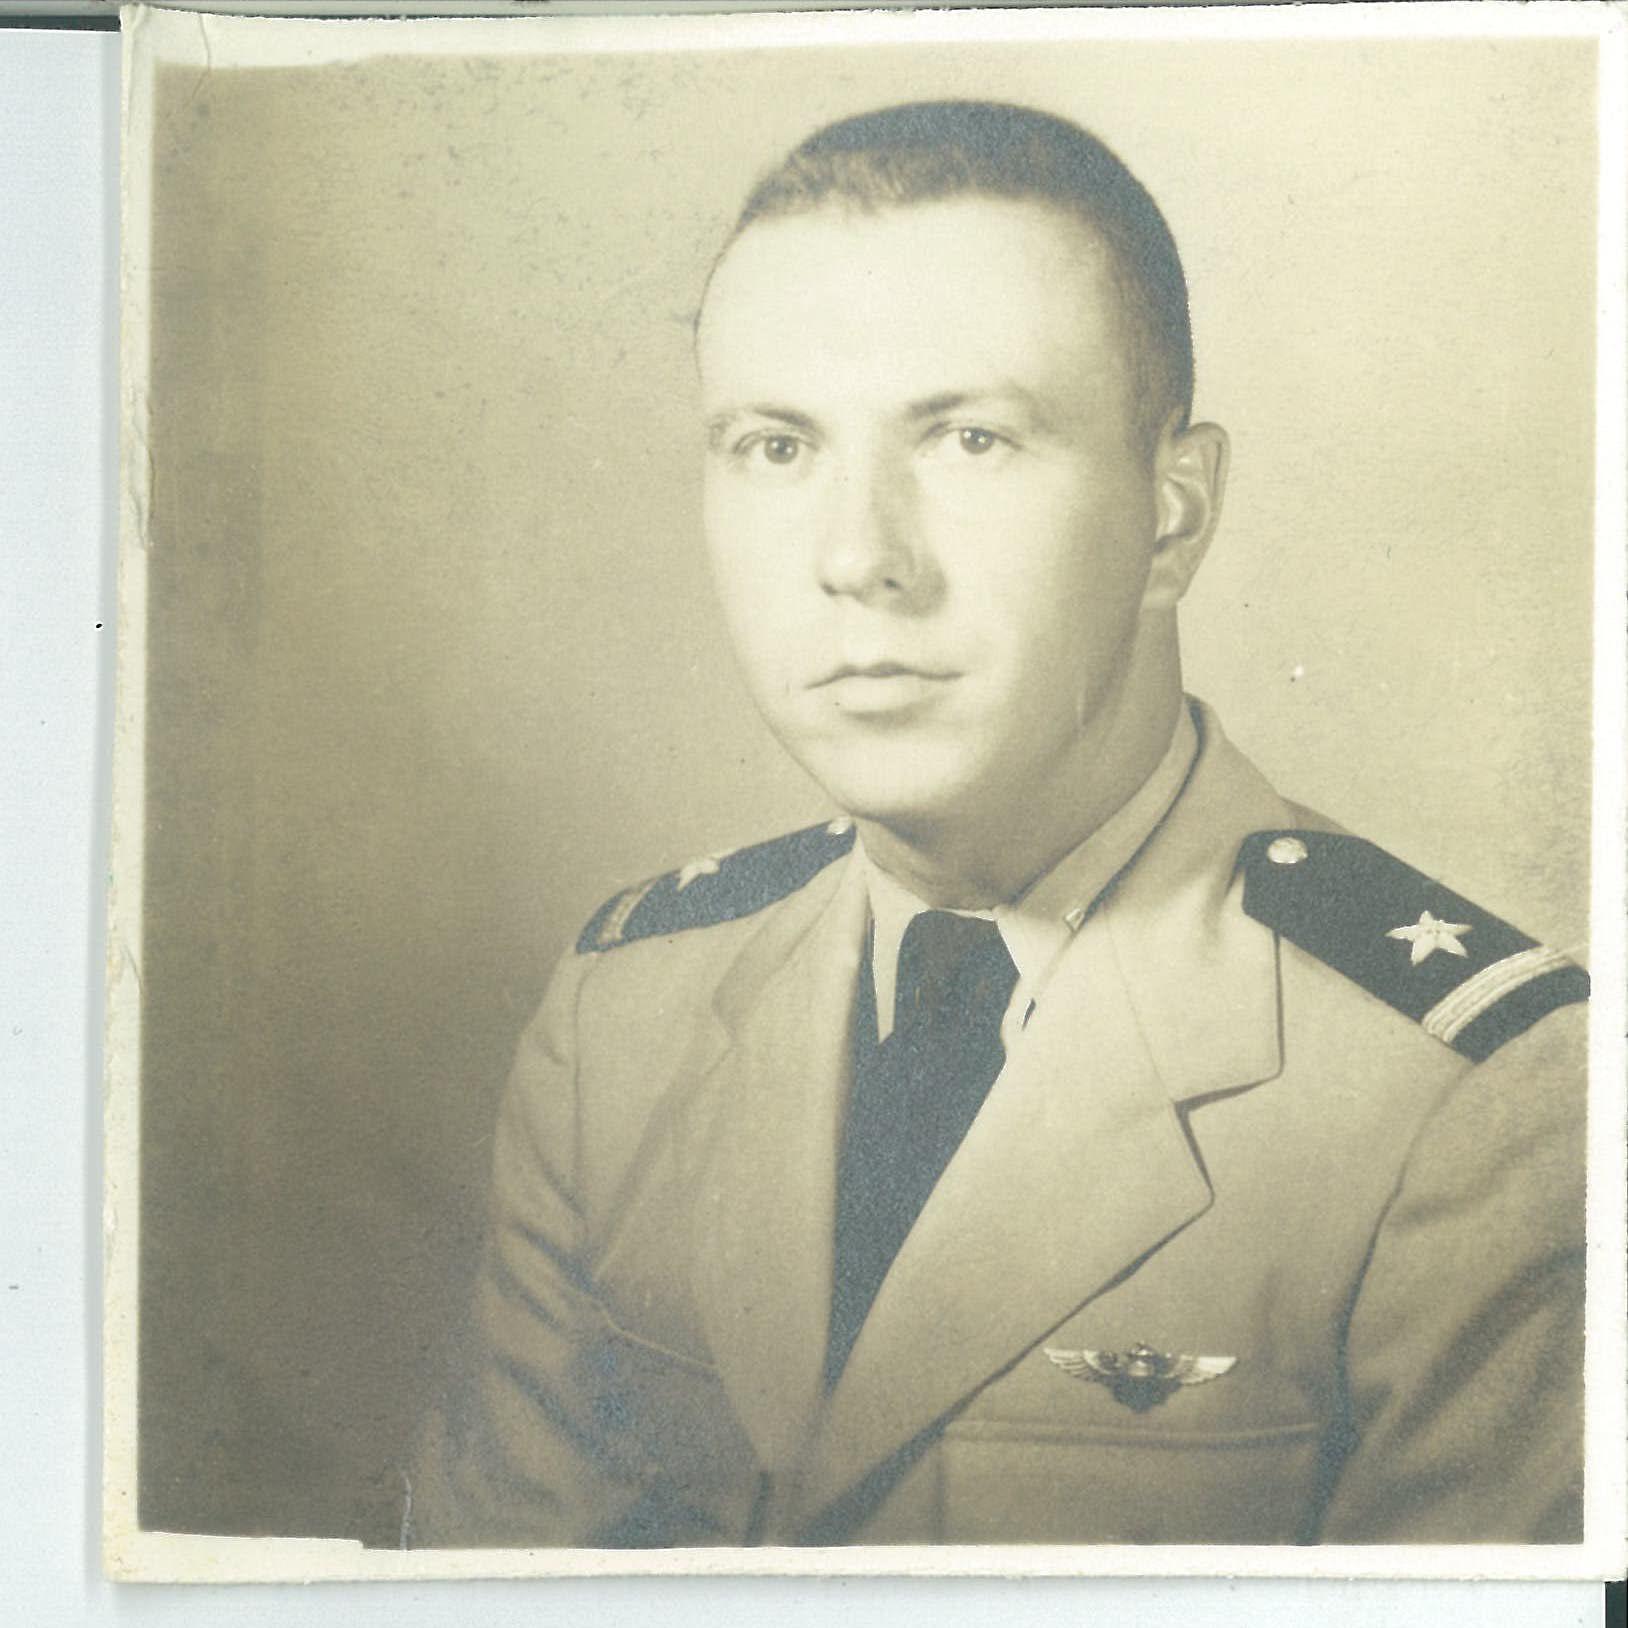 Obituary for Charles Eugene Schott (Photo album)